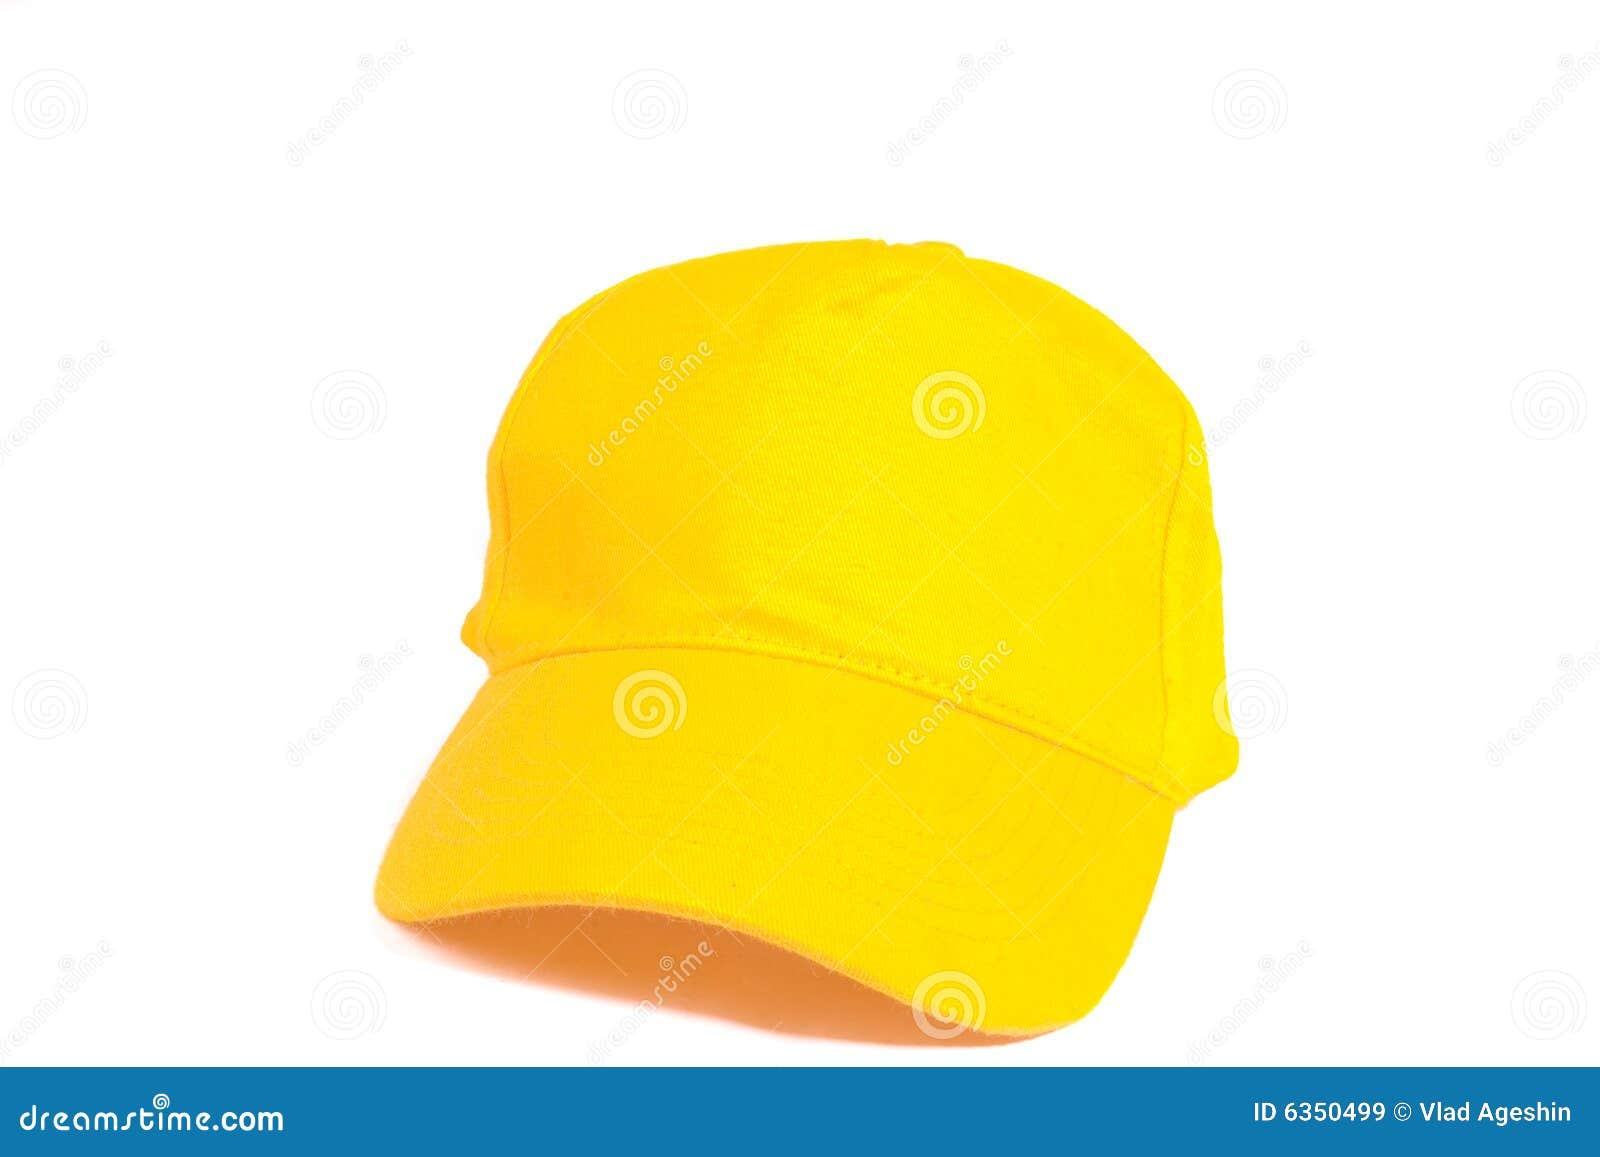 Blank Yellow Baseball Cap stock image. Image of headware - 6350499 29e8096c271